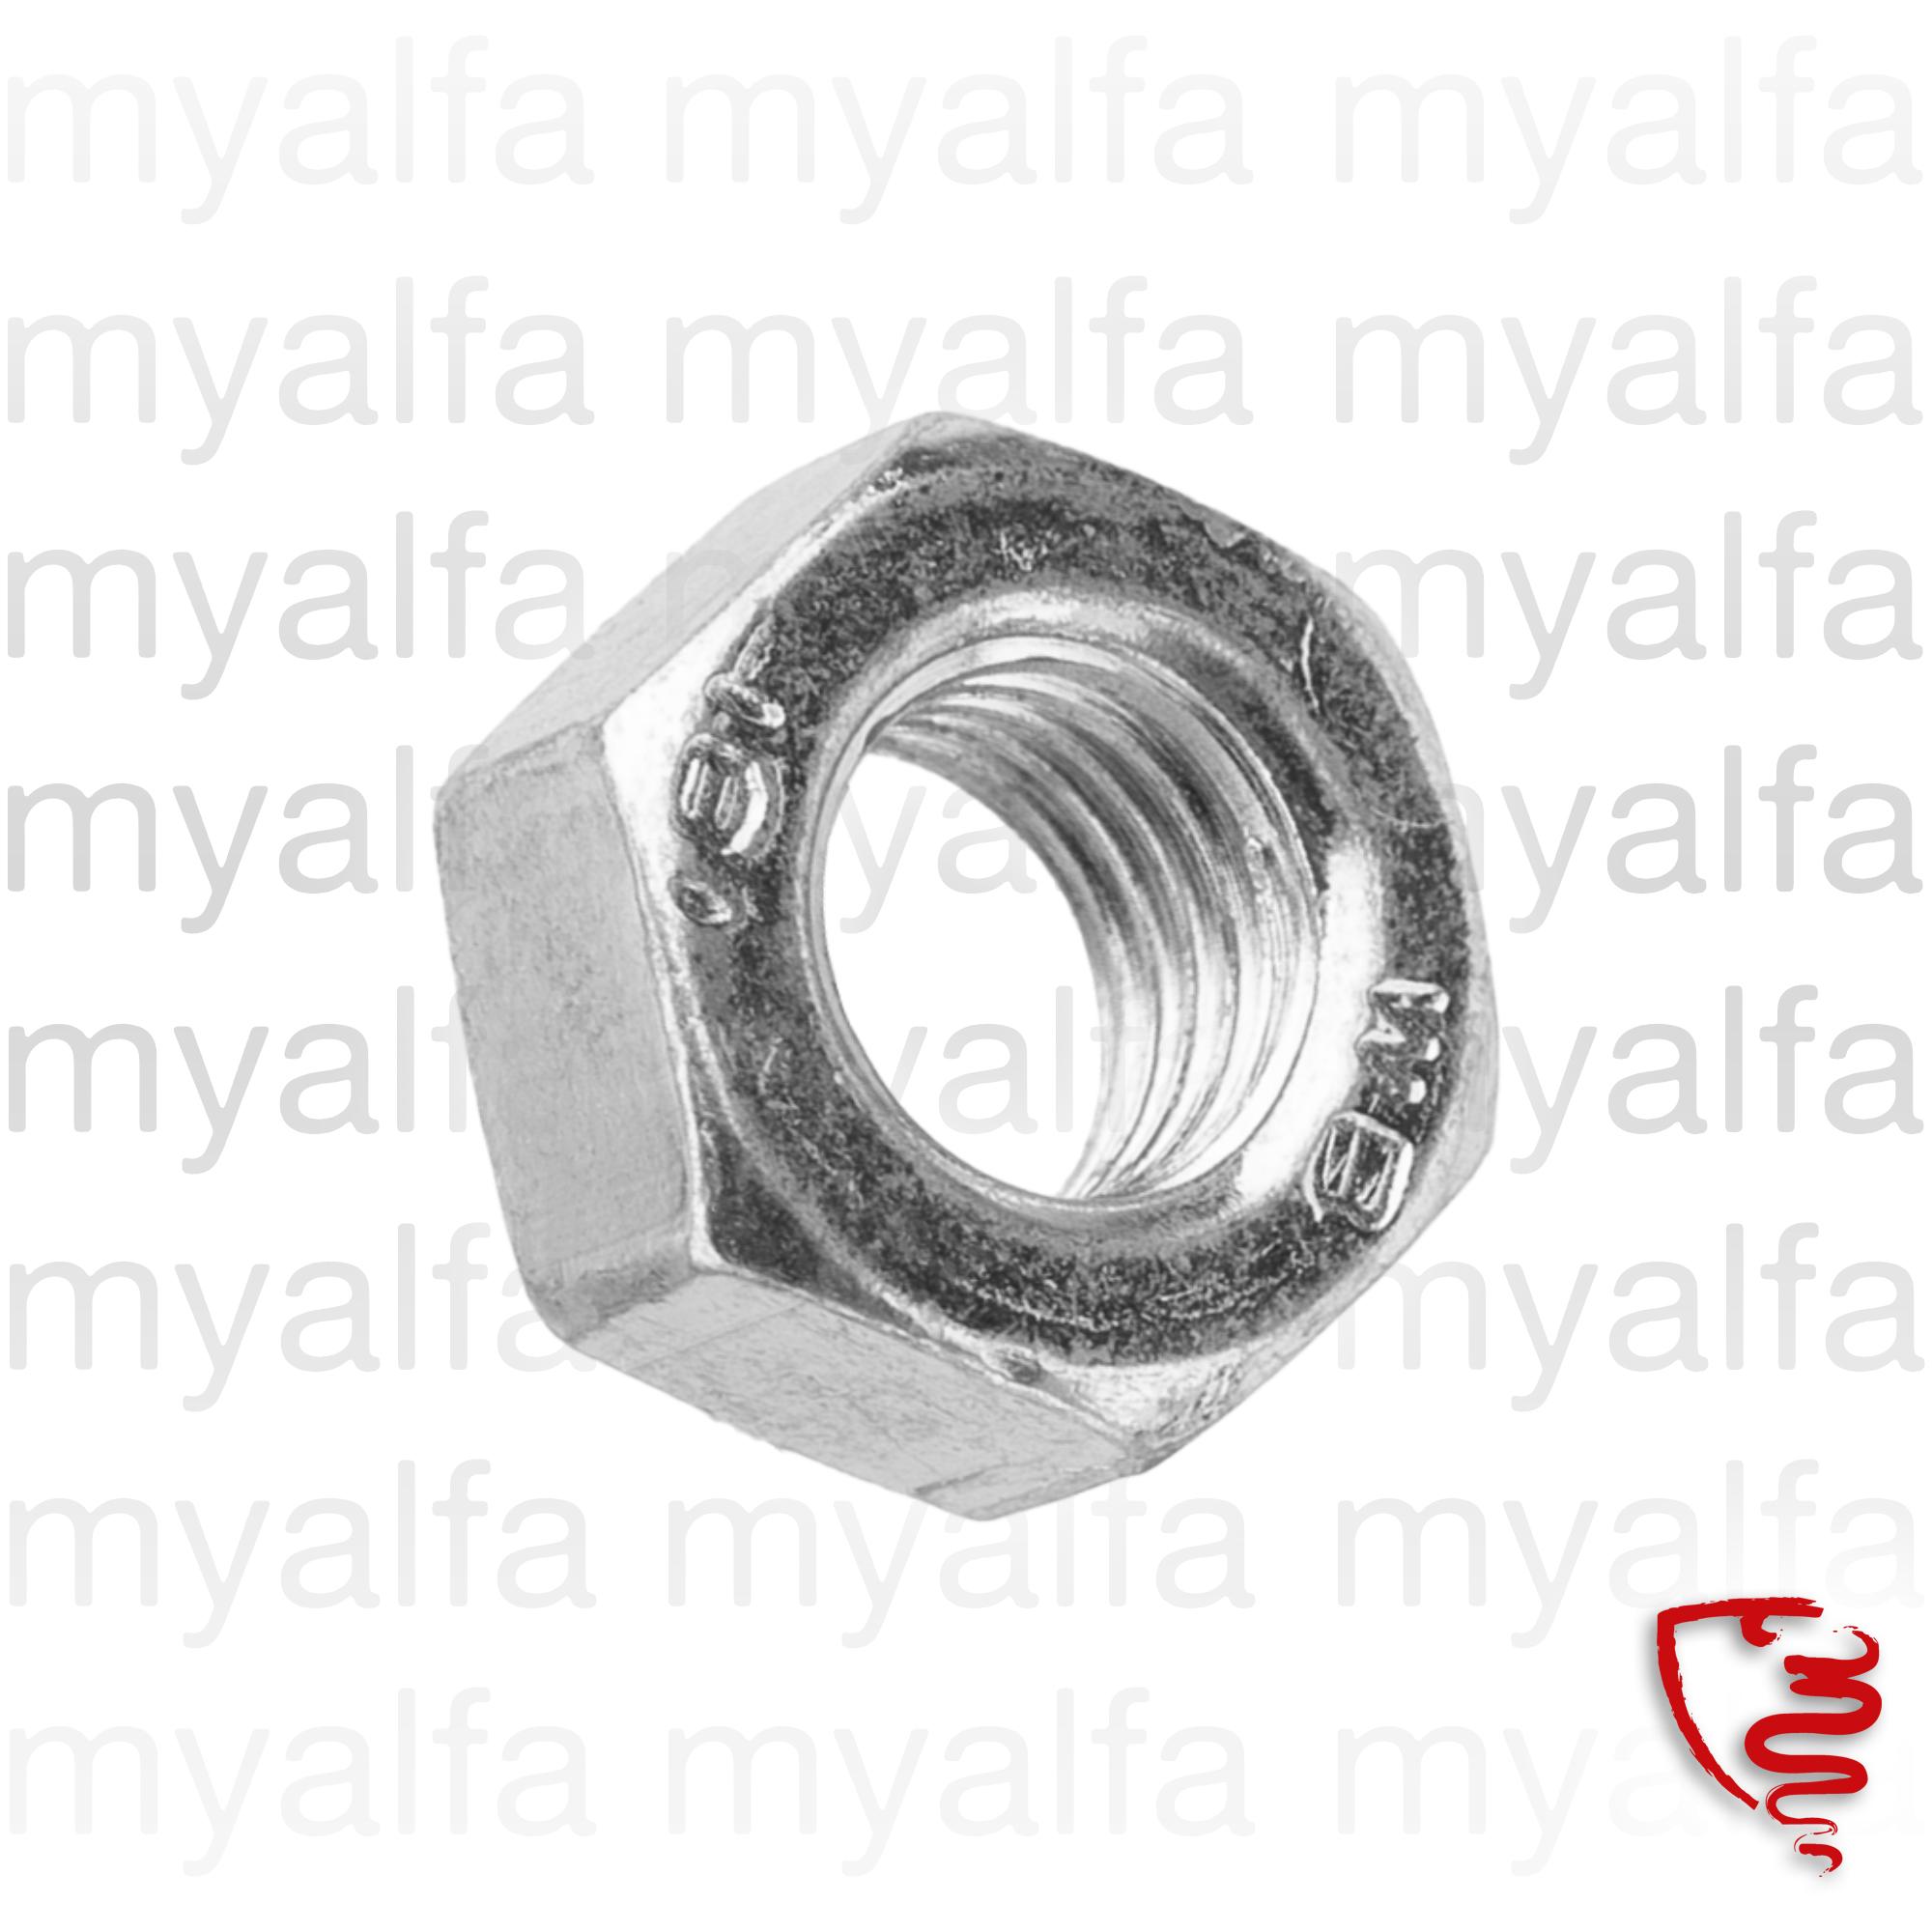 Nut / female A 13 mm - step 8x1 for 105/115, Engine, Cylinder head, Head